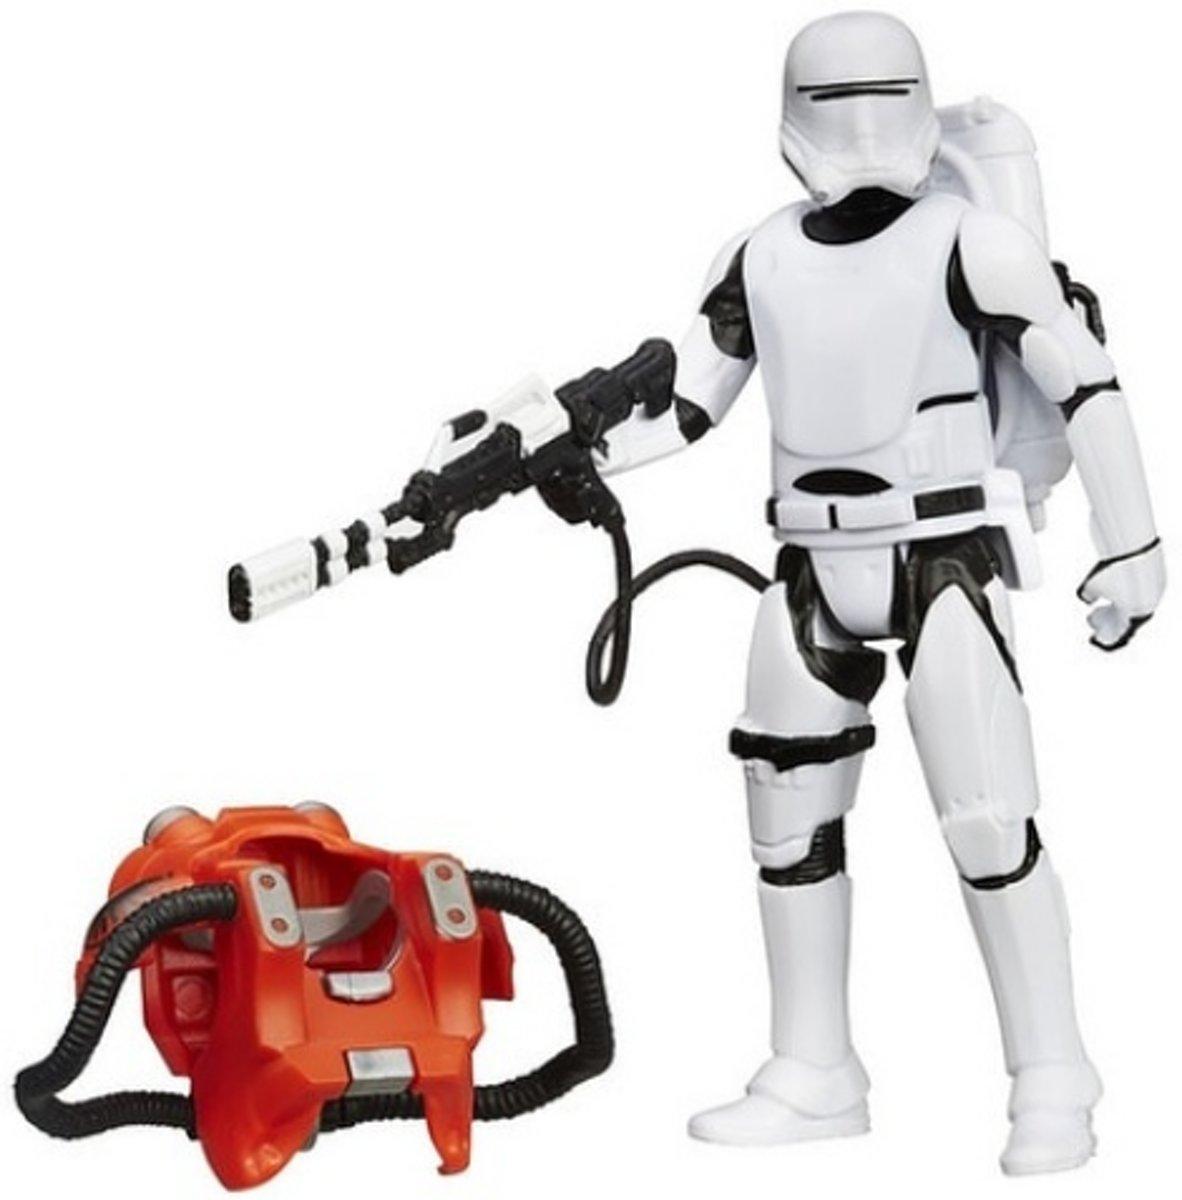 Action figure Star Wars Pack 10 cm Flametrooper